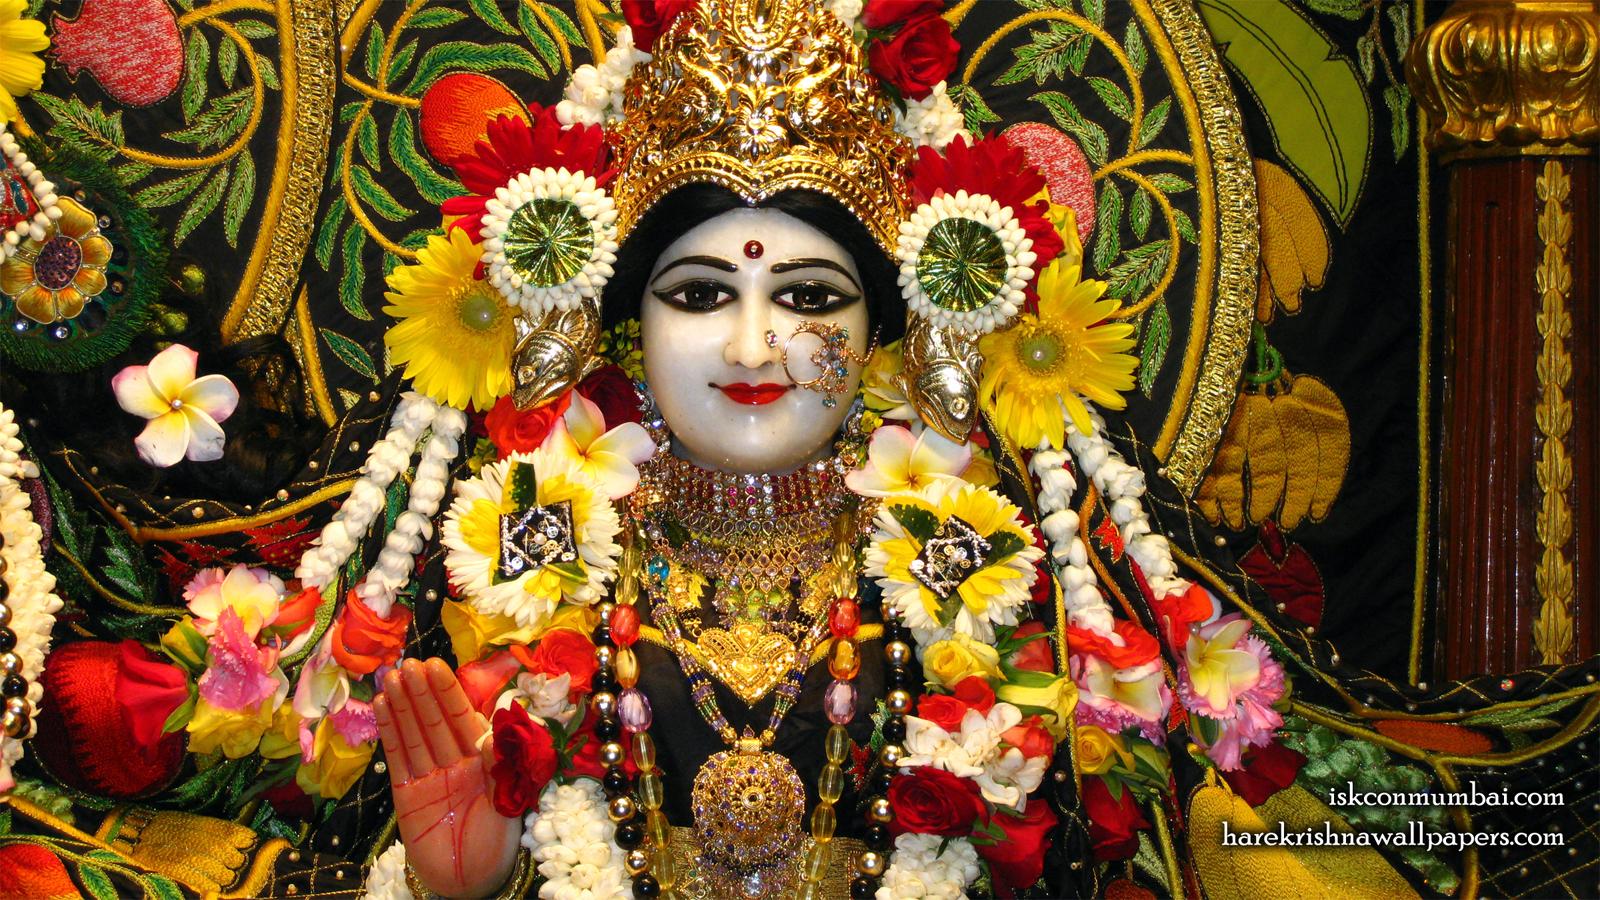 Sri Radha Face Wallpaper (008) Size 1600x900 Download